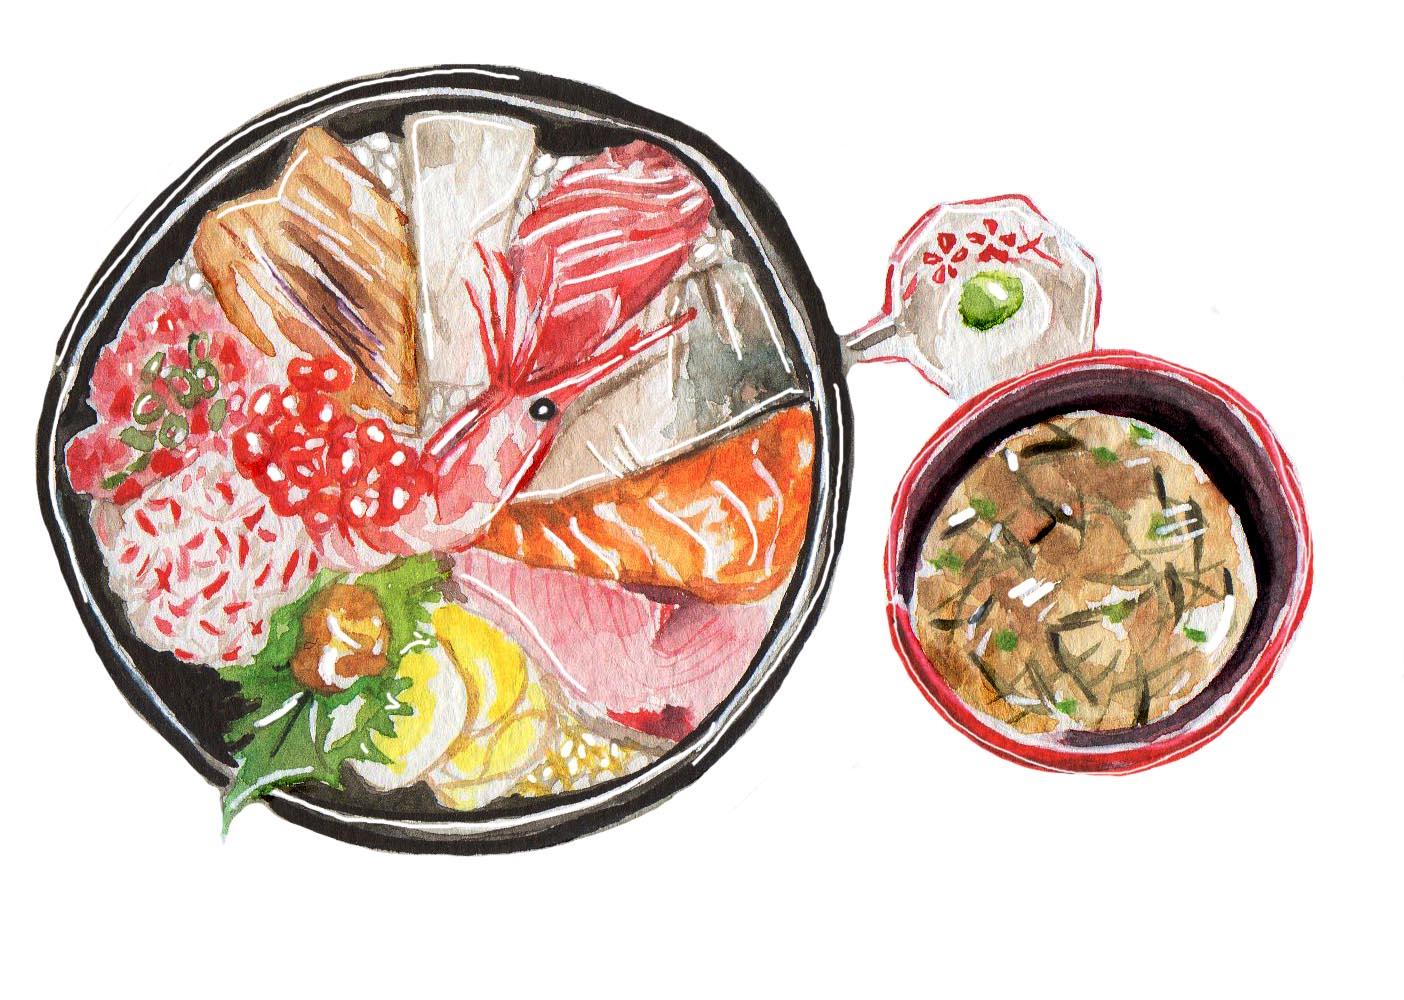 Kaisendon (Fresh Seafood Bowl)